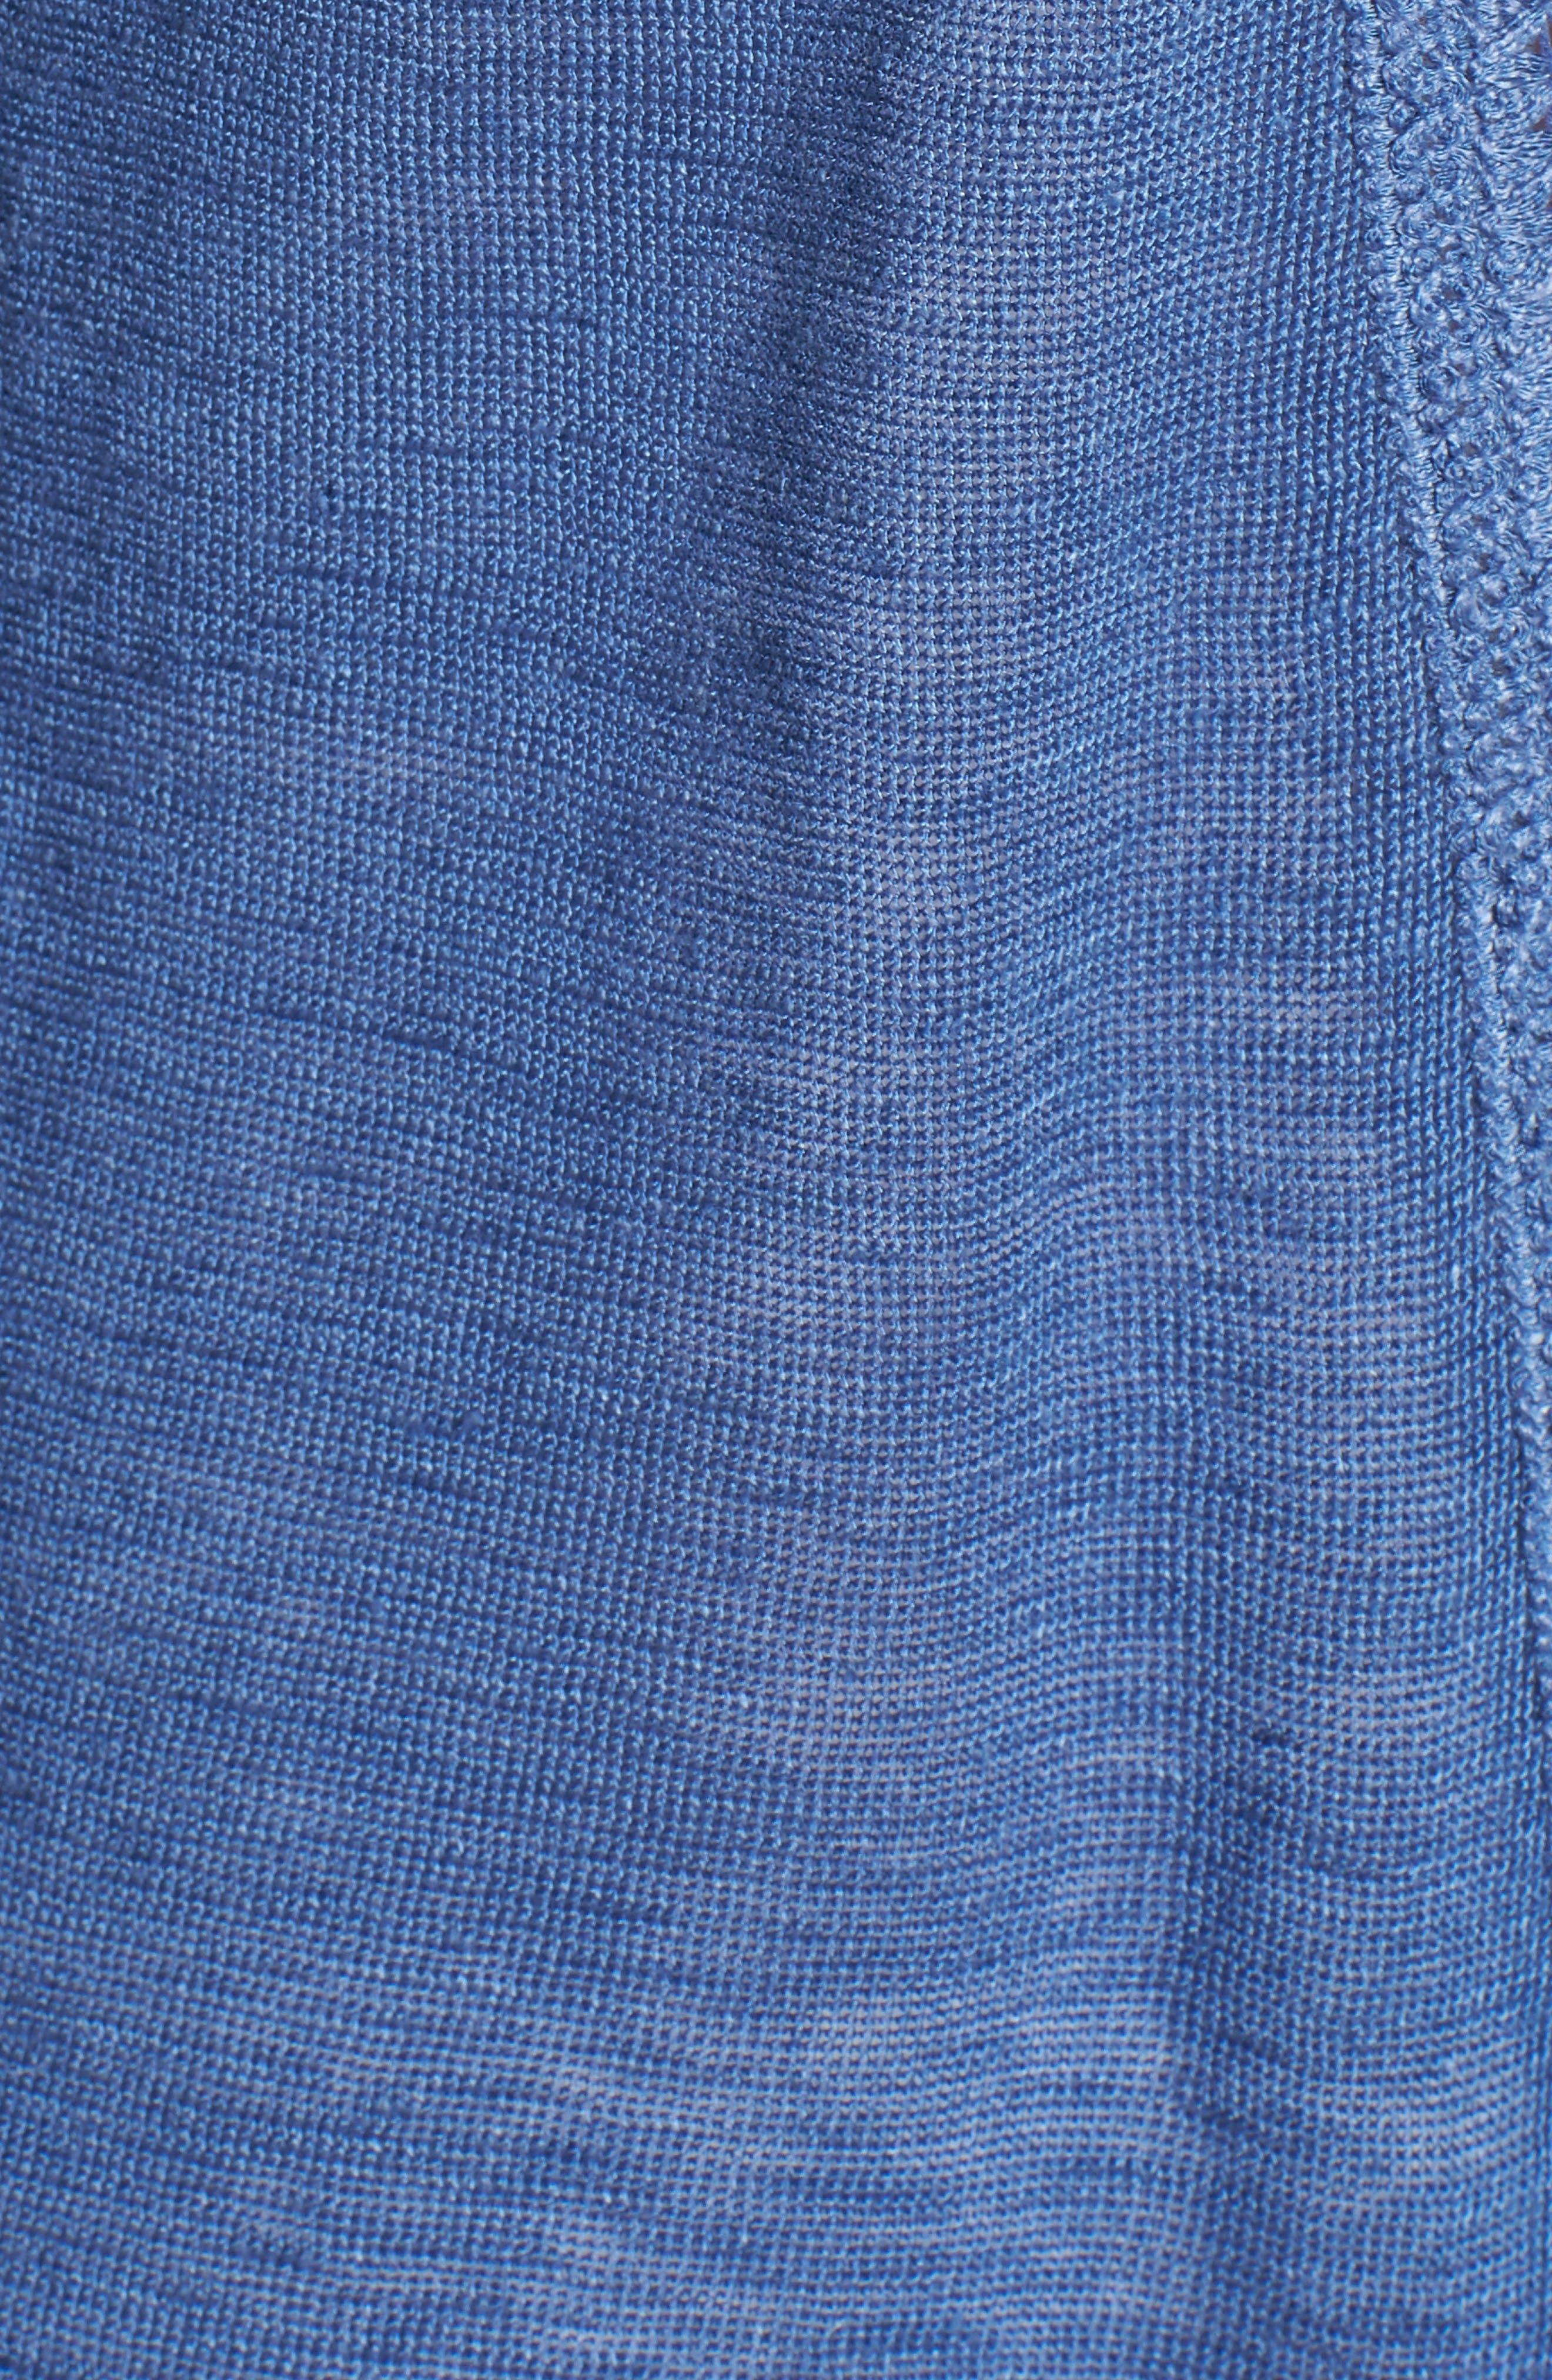 Crochet Trim Linen Blend Cardigan,                             Alternate thumbnail 5, color,                             400